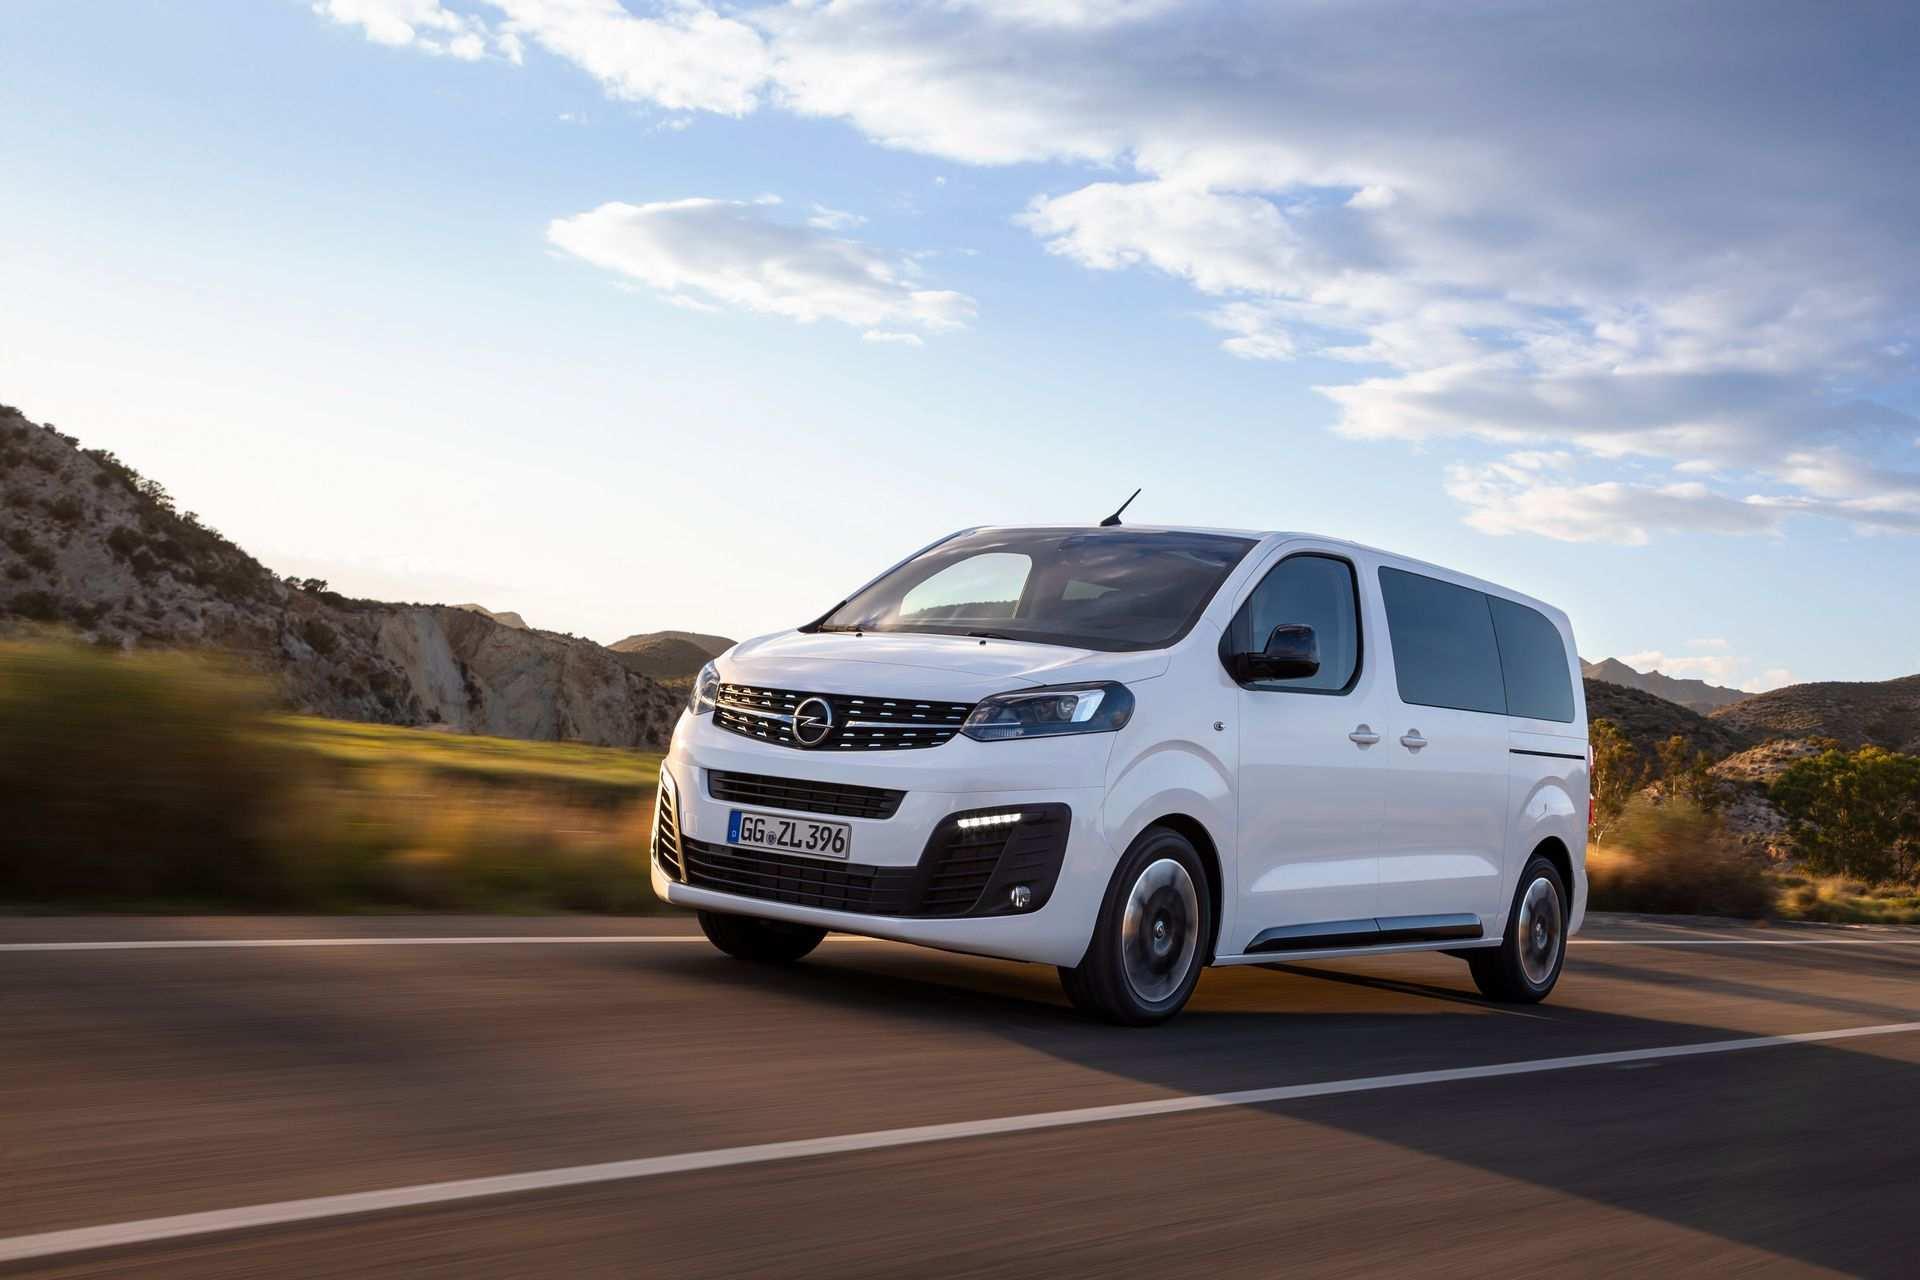 15 Best Review Futur Opel Zafira 2020 Pricing by Futur Opel Zafira 2020